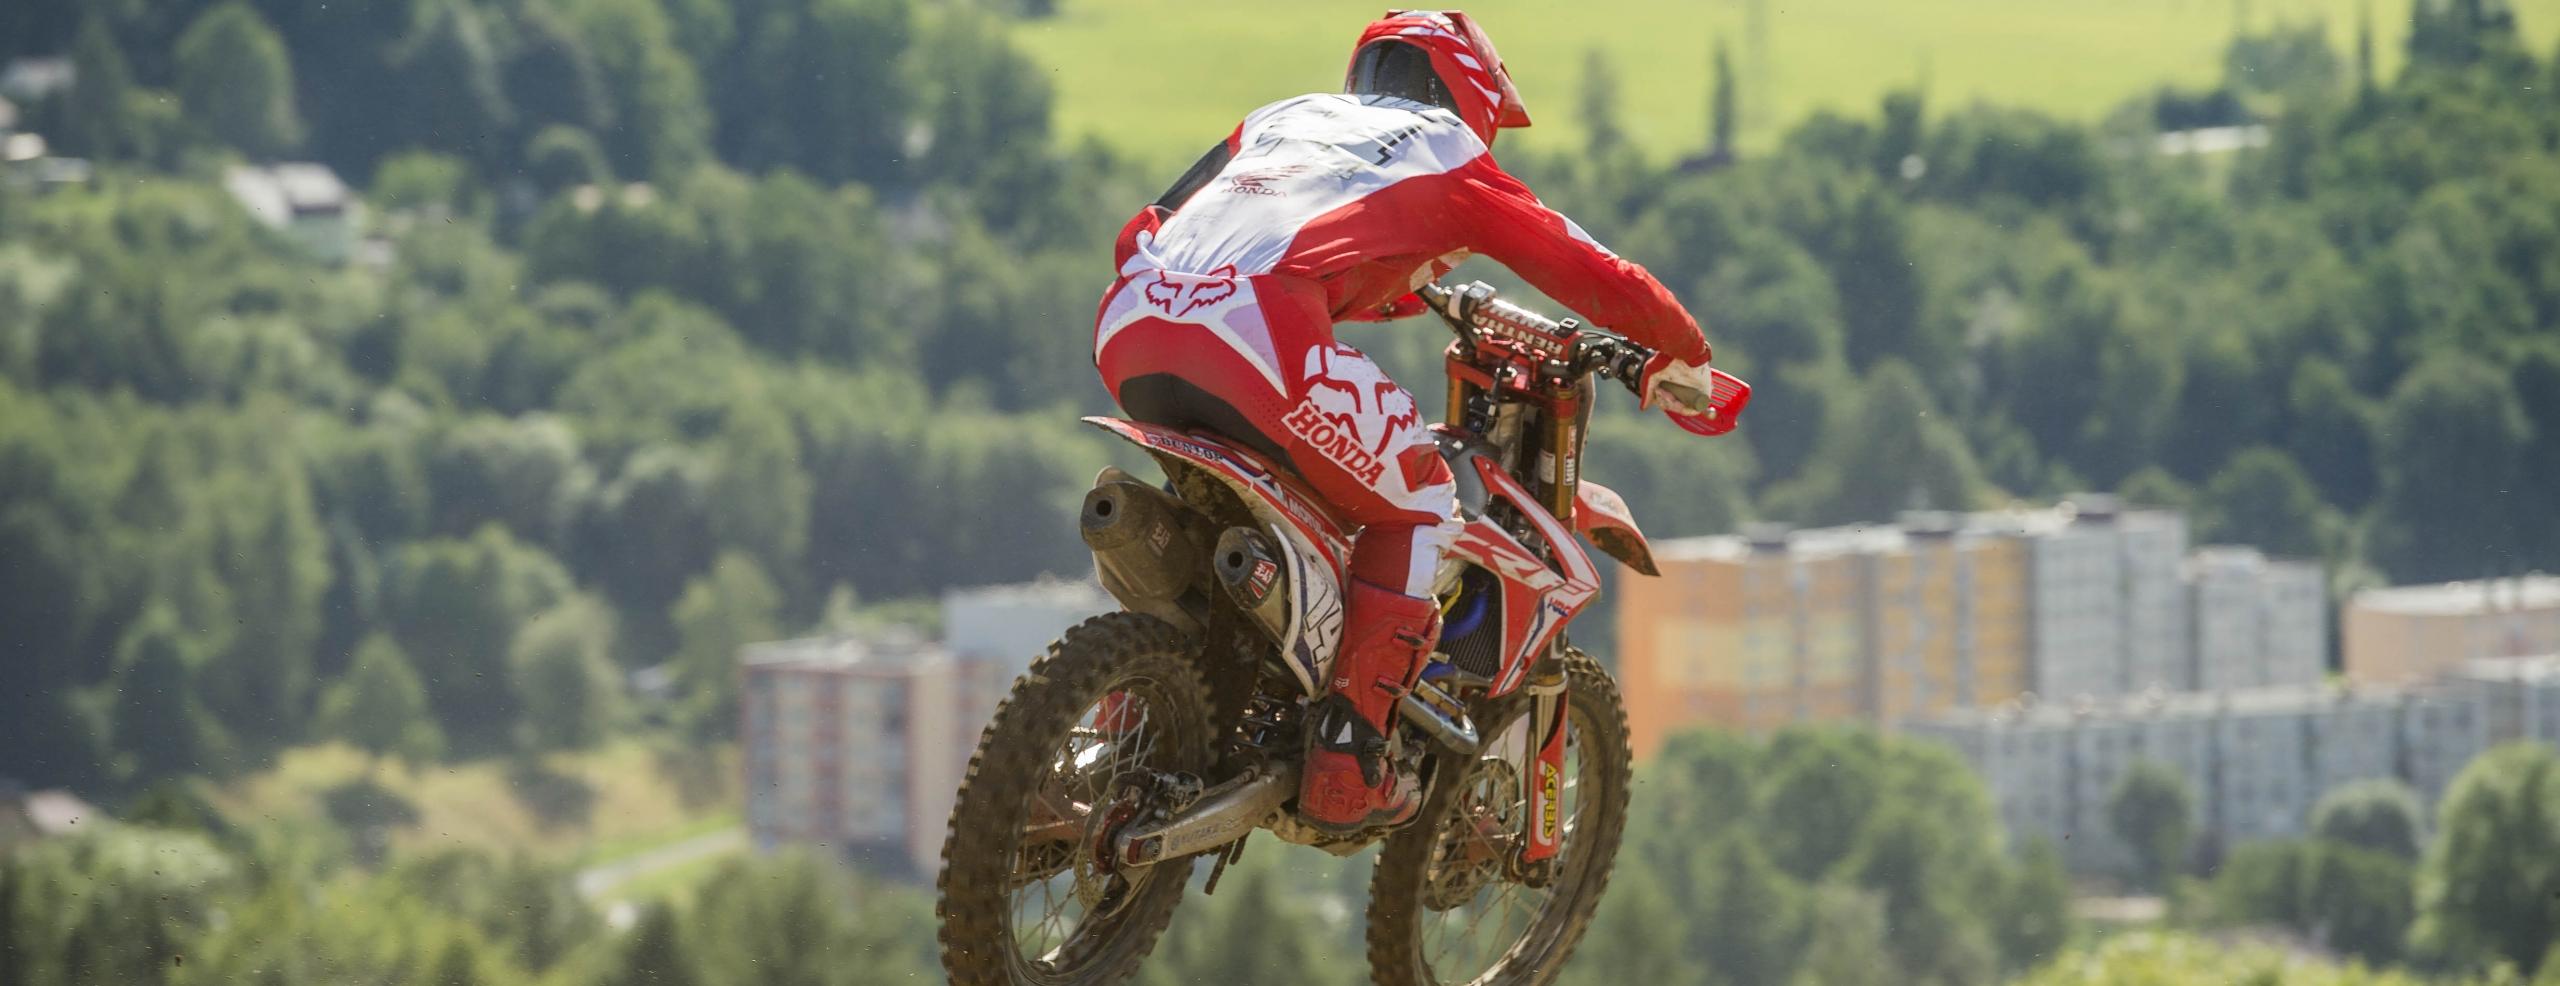 Beaton shows promising start in Loket